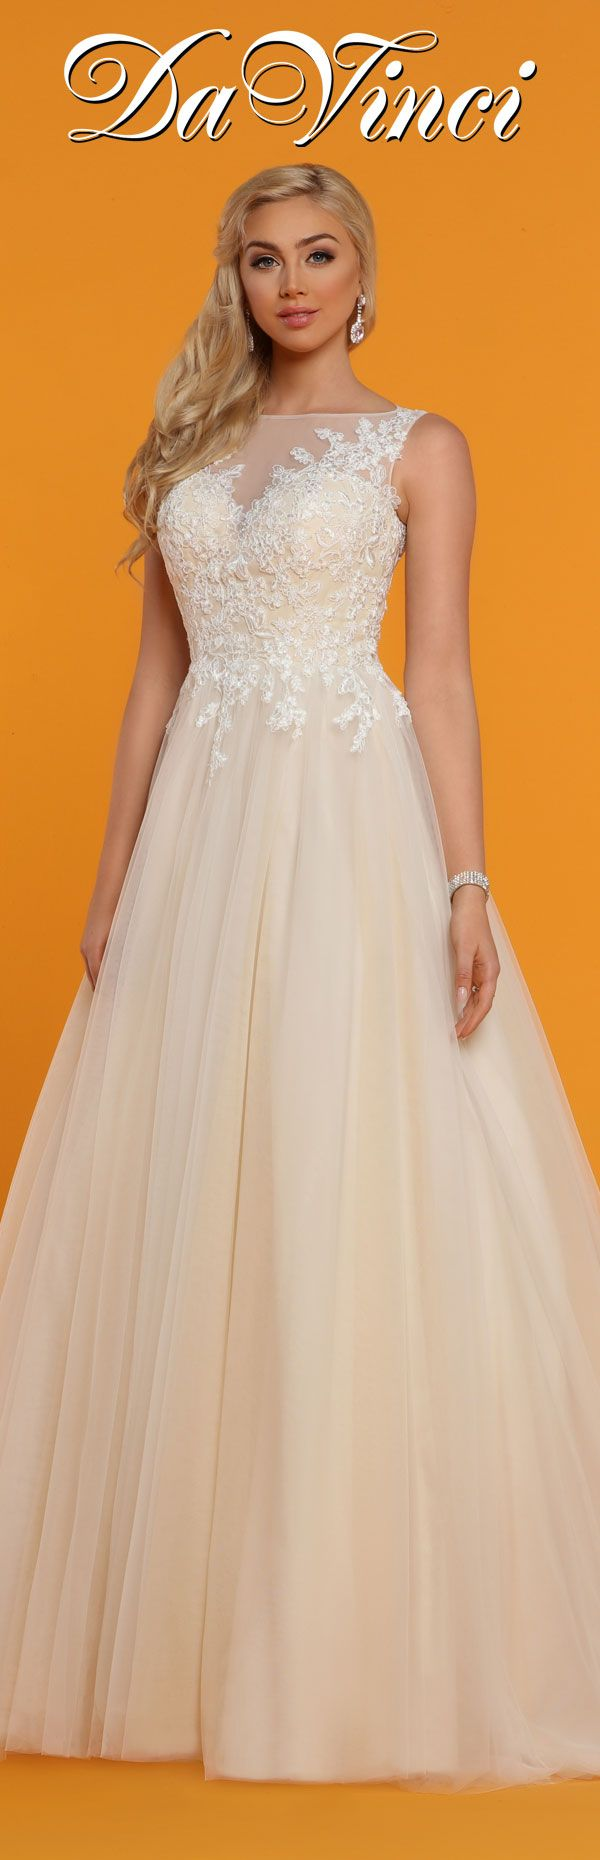 Davinci Bridal Style 50515 Wedding Gown Styles Beautiful Wedding Gowns Bridal Dresses Online